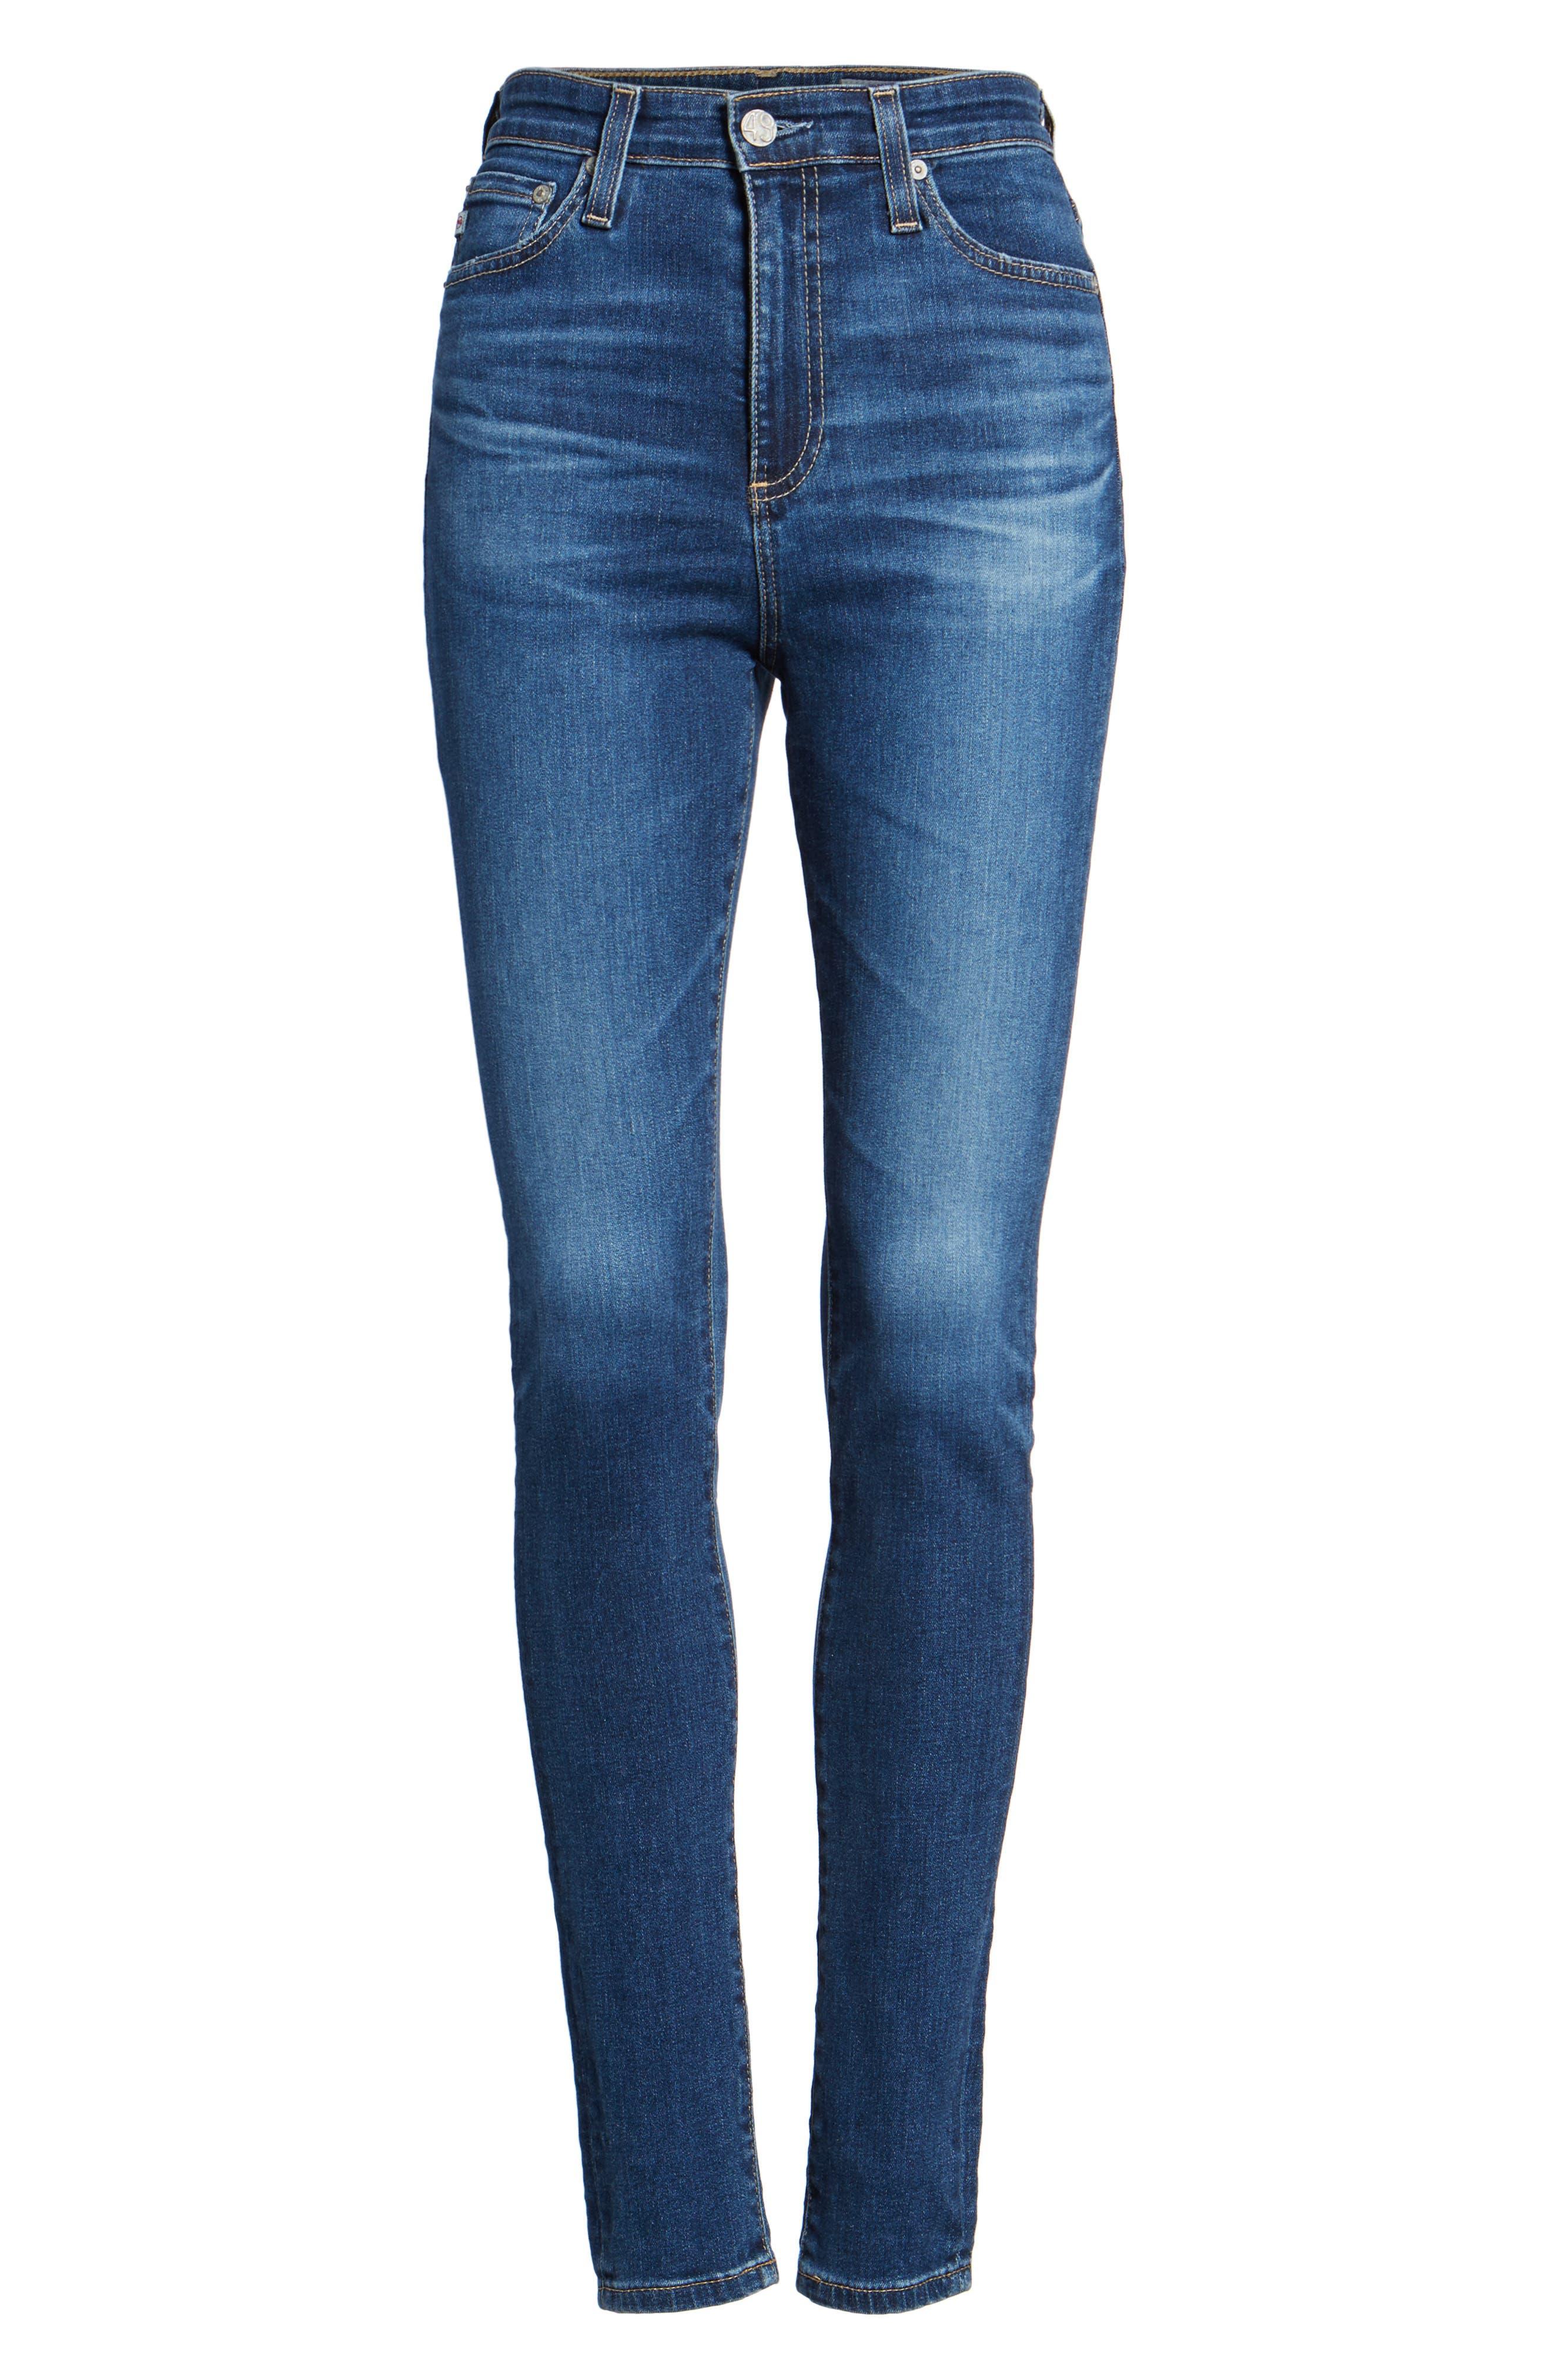 Mila High Waist Skinny Jeans,                             Alternate thumbnail 6, color,                             473